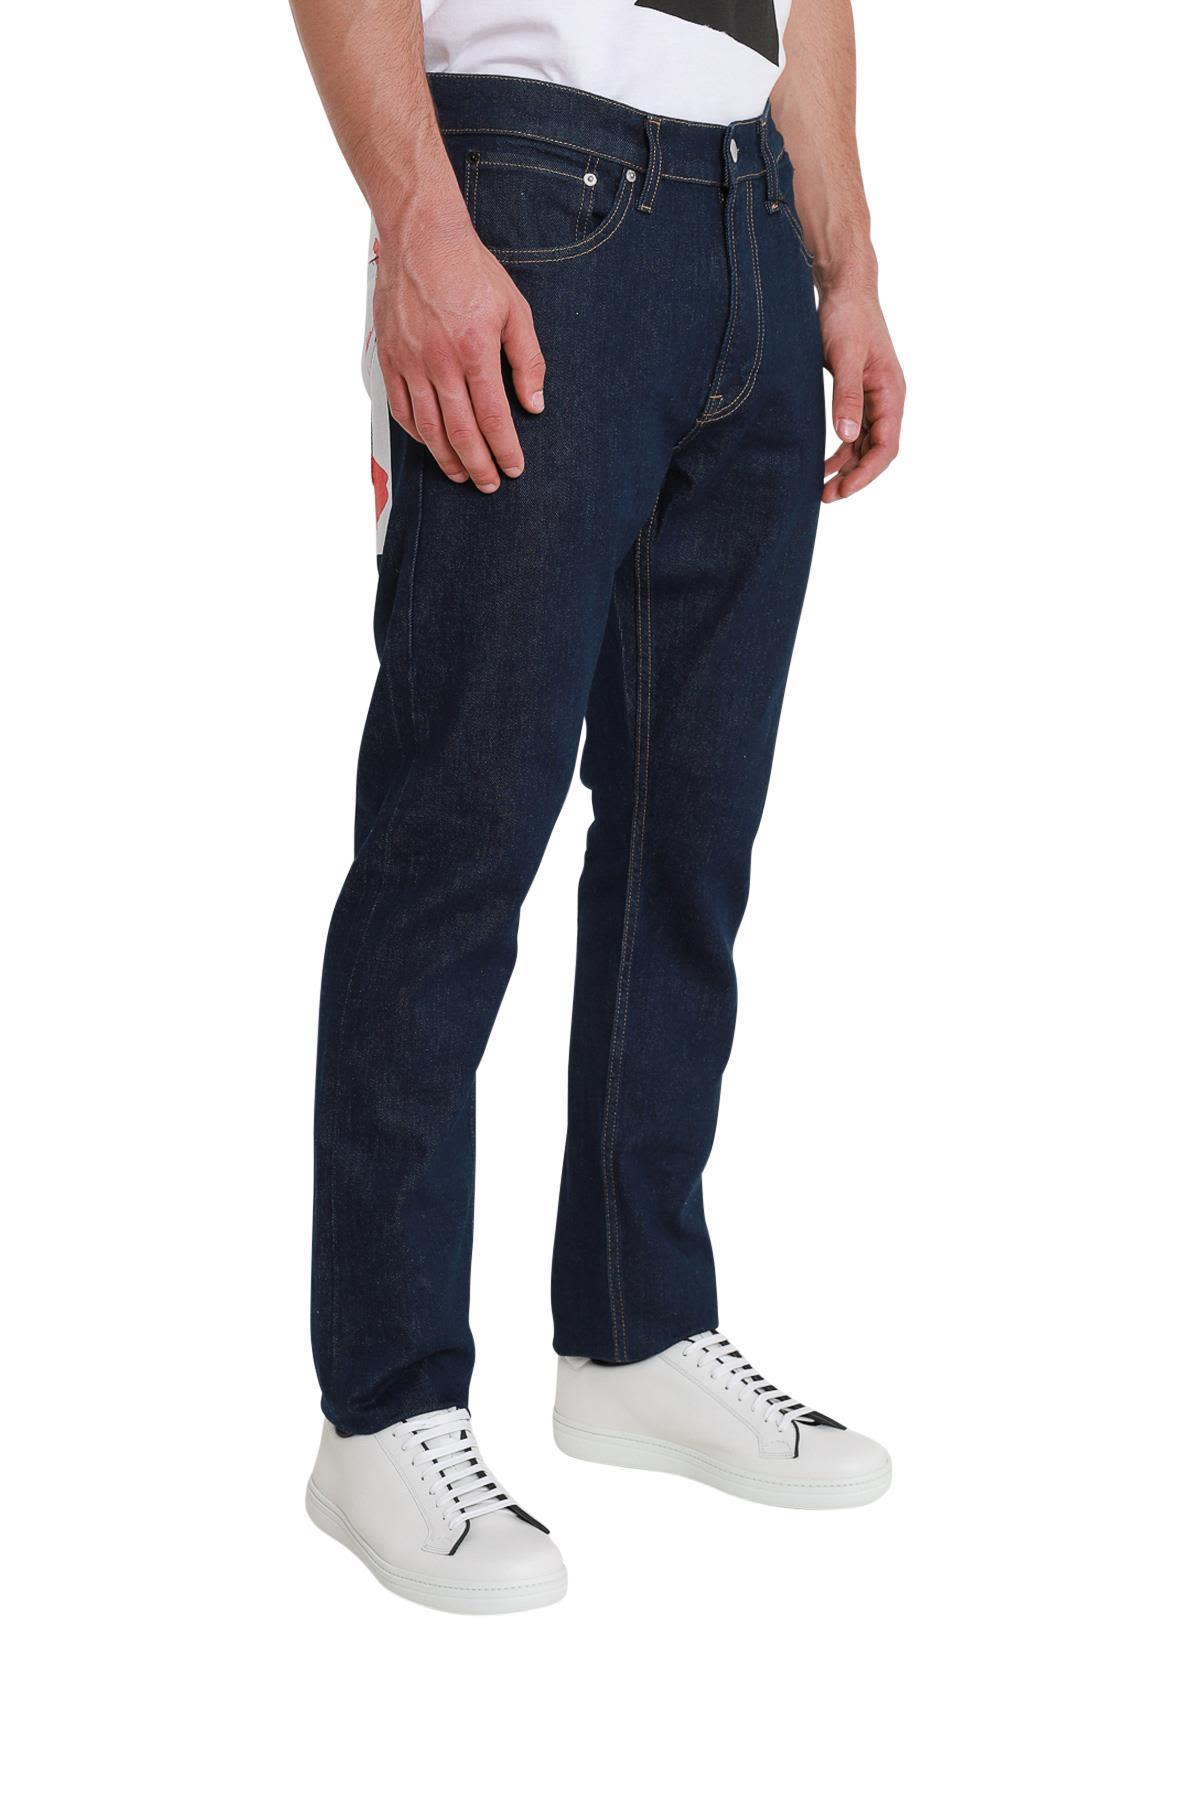 Calvin Klein Jeans Warhol Portrait Jeans